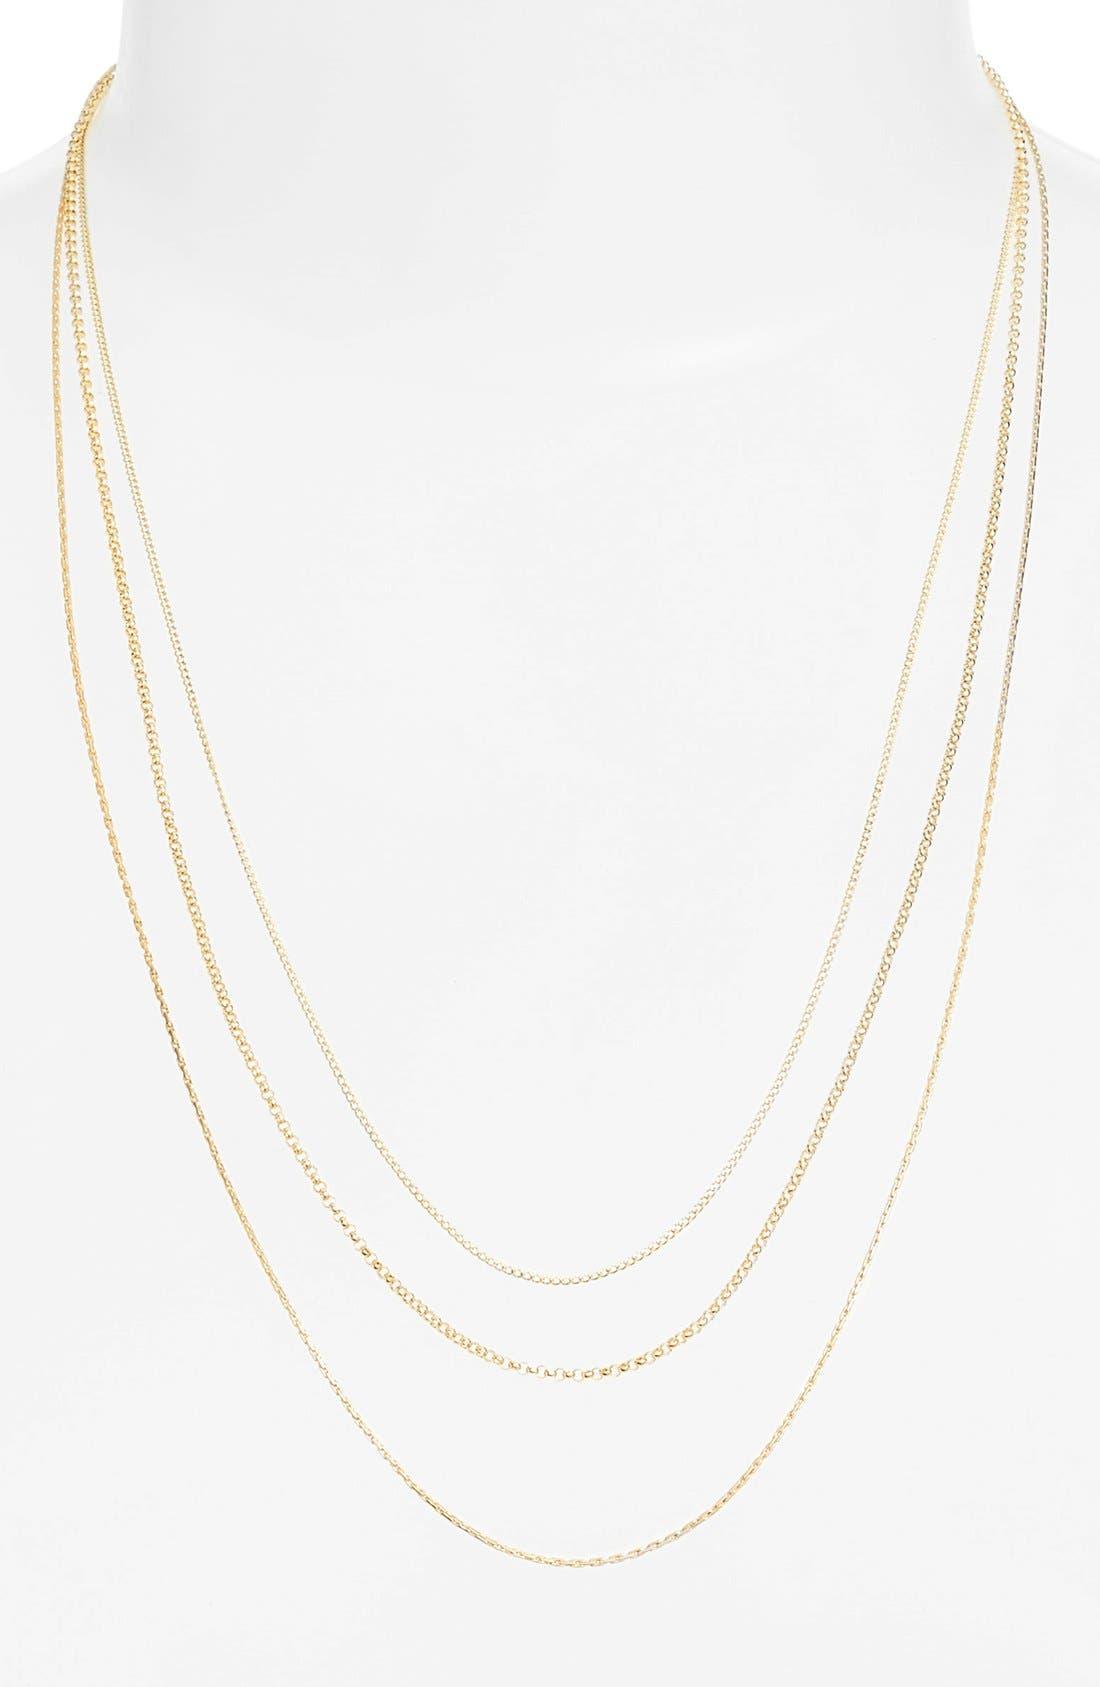 Leah Alexandra Multistrand Chain Necklace